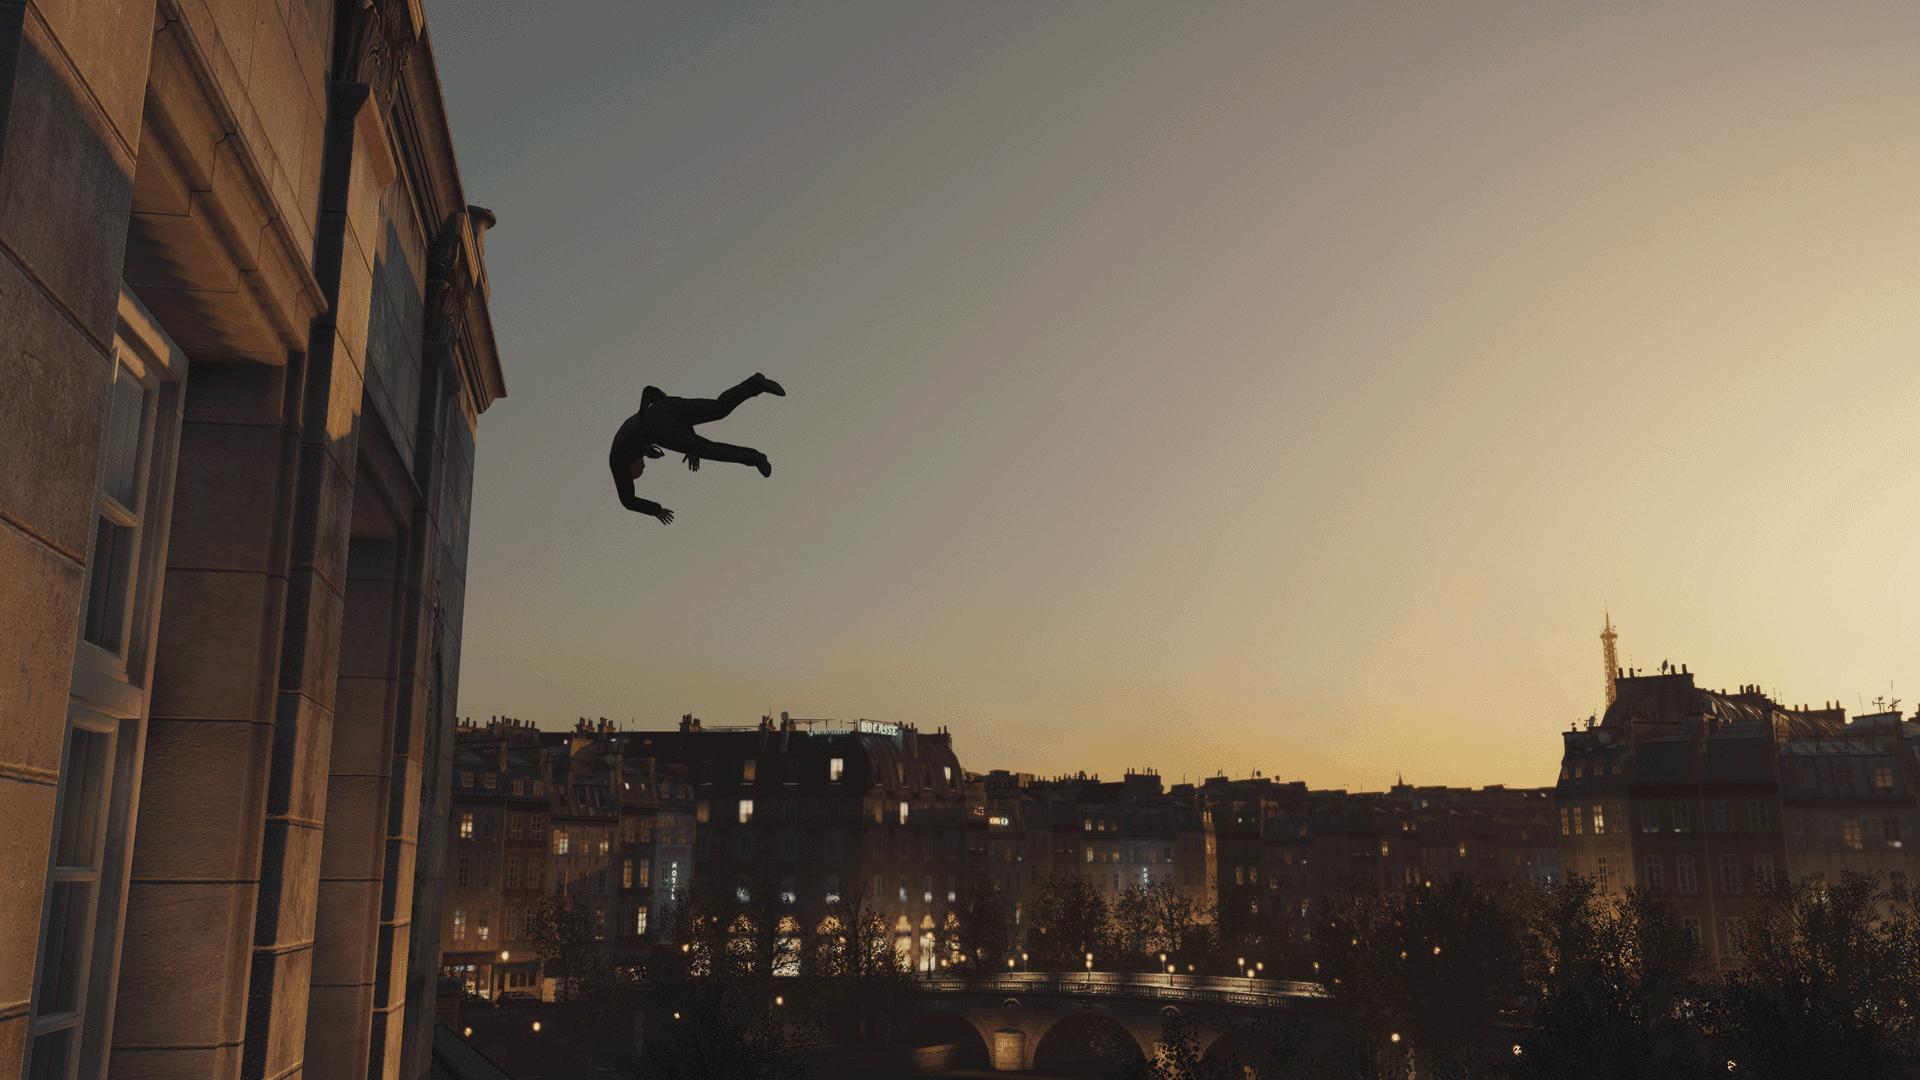 hitman-falling